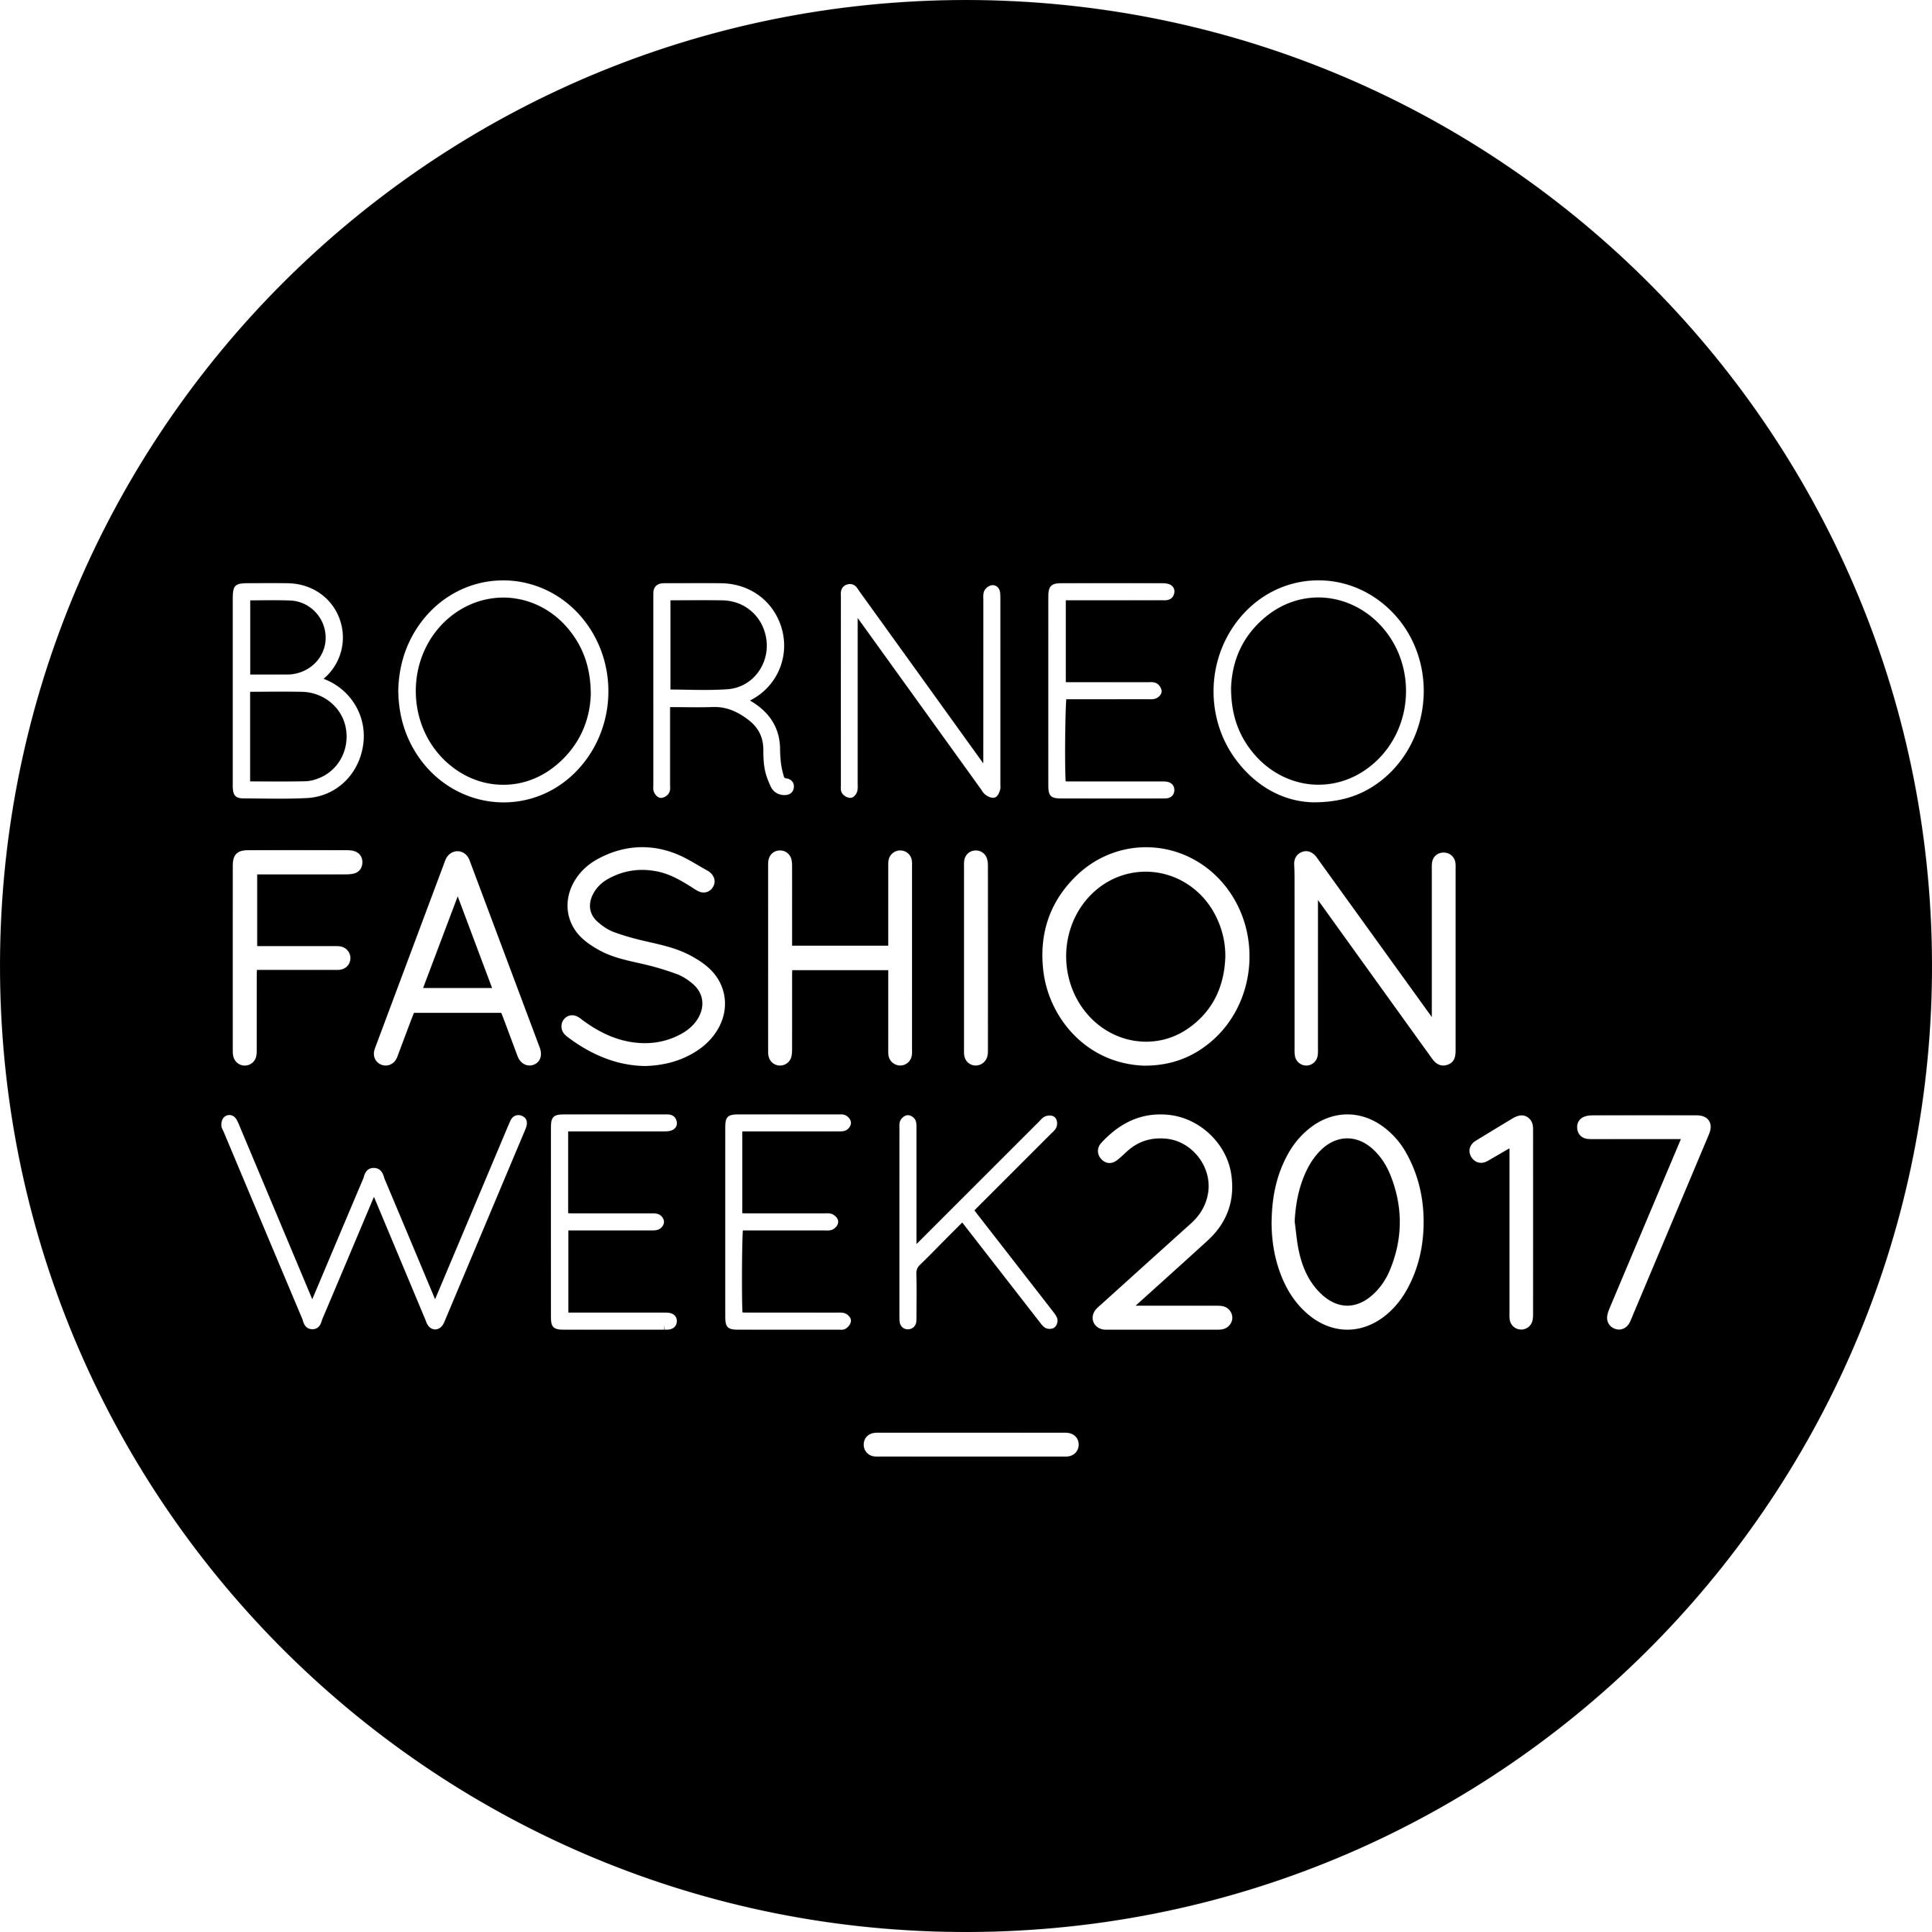 Home | SPARK @ Borneo 744, Kuching 2017